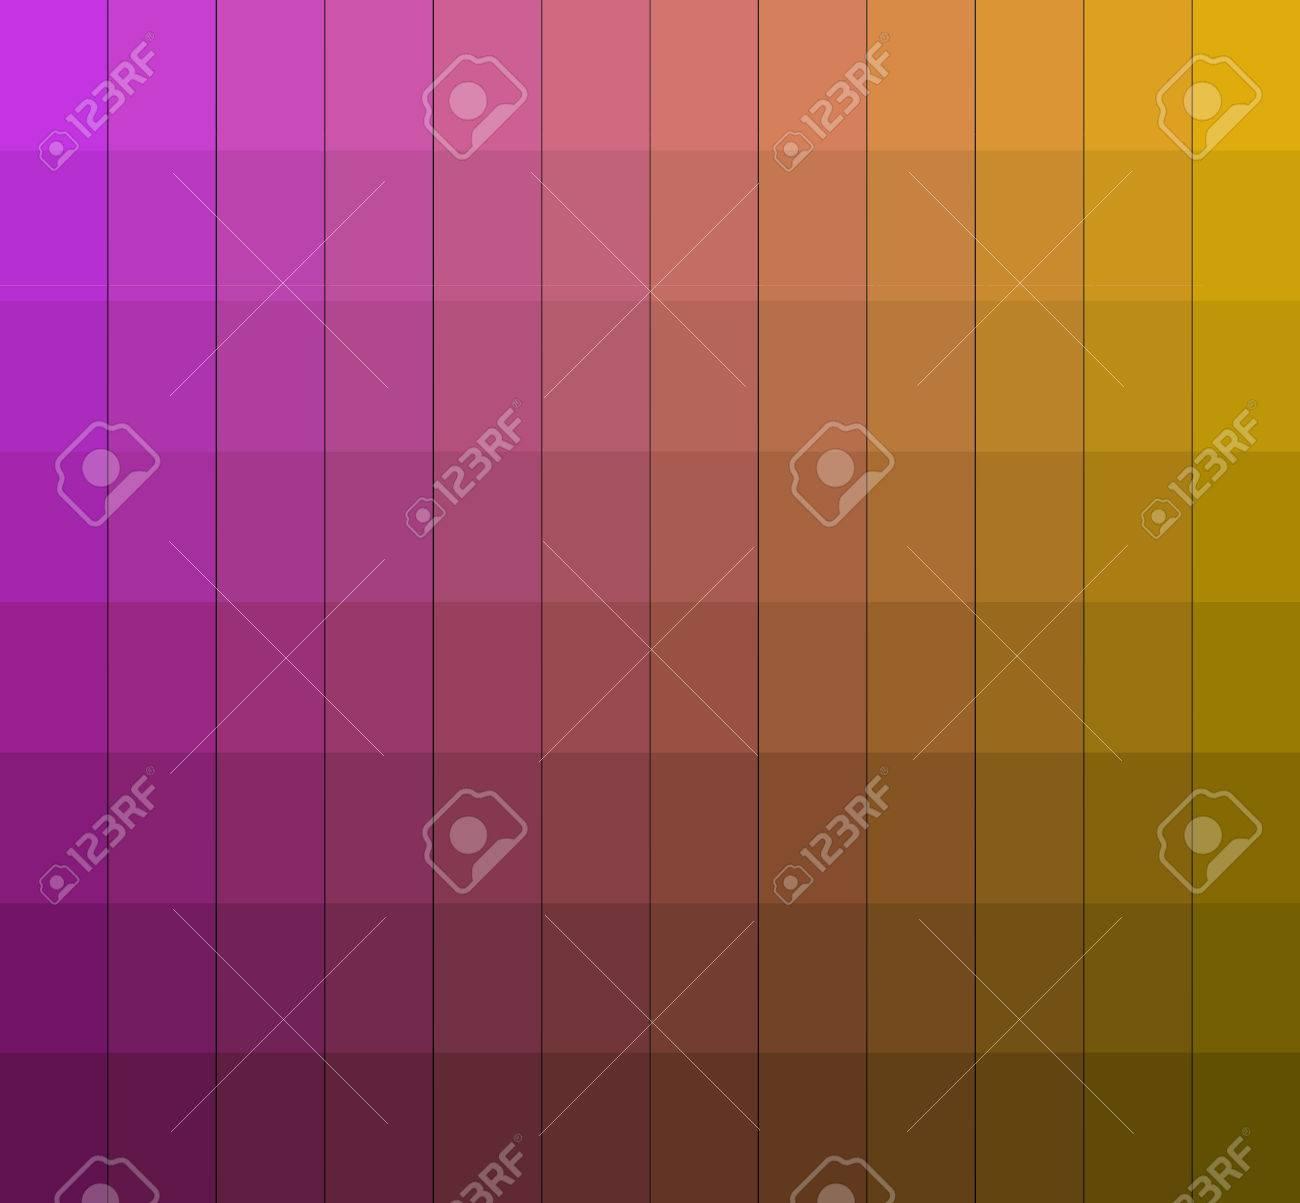 Shades of colors chartlor box vector illustration pantone shades of colors chartlor box vector illustration pantone stock vector 58997604 nvjuhfo Images